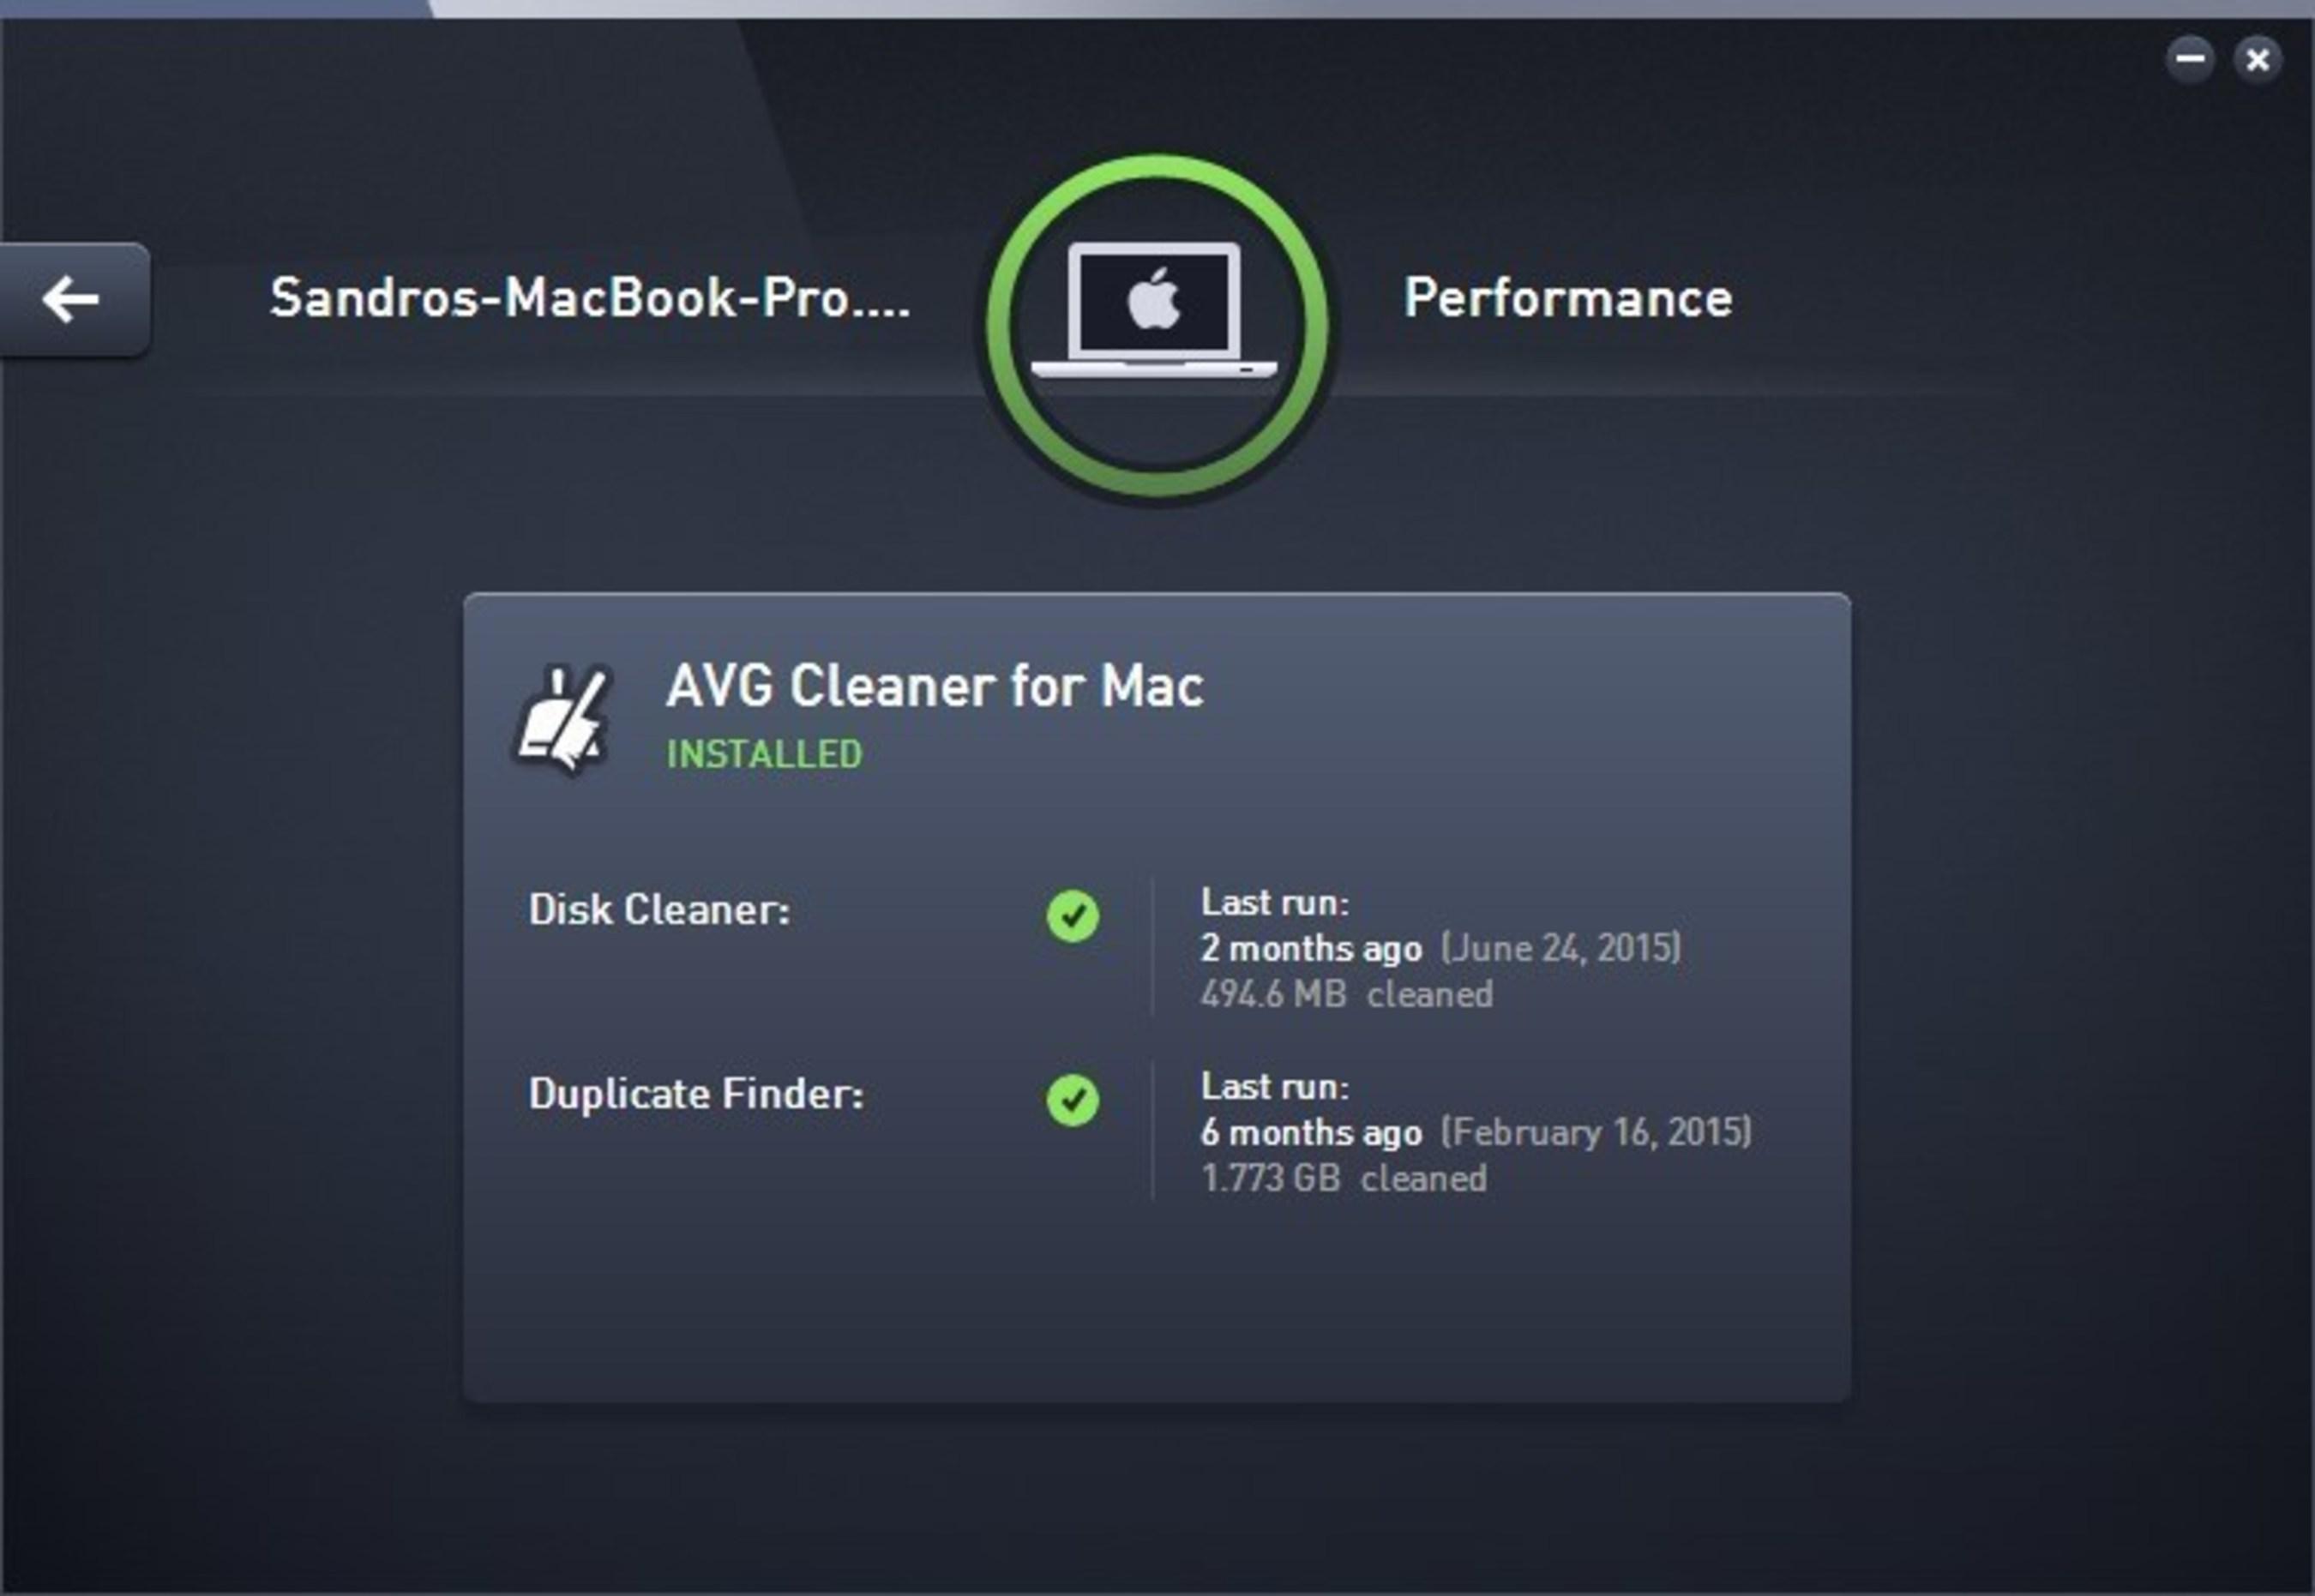 avg computer performance